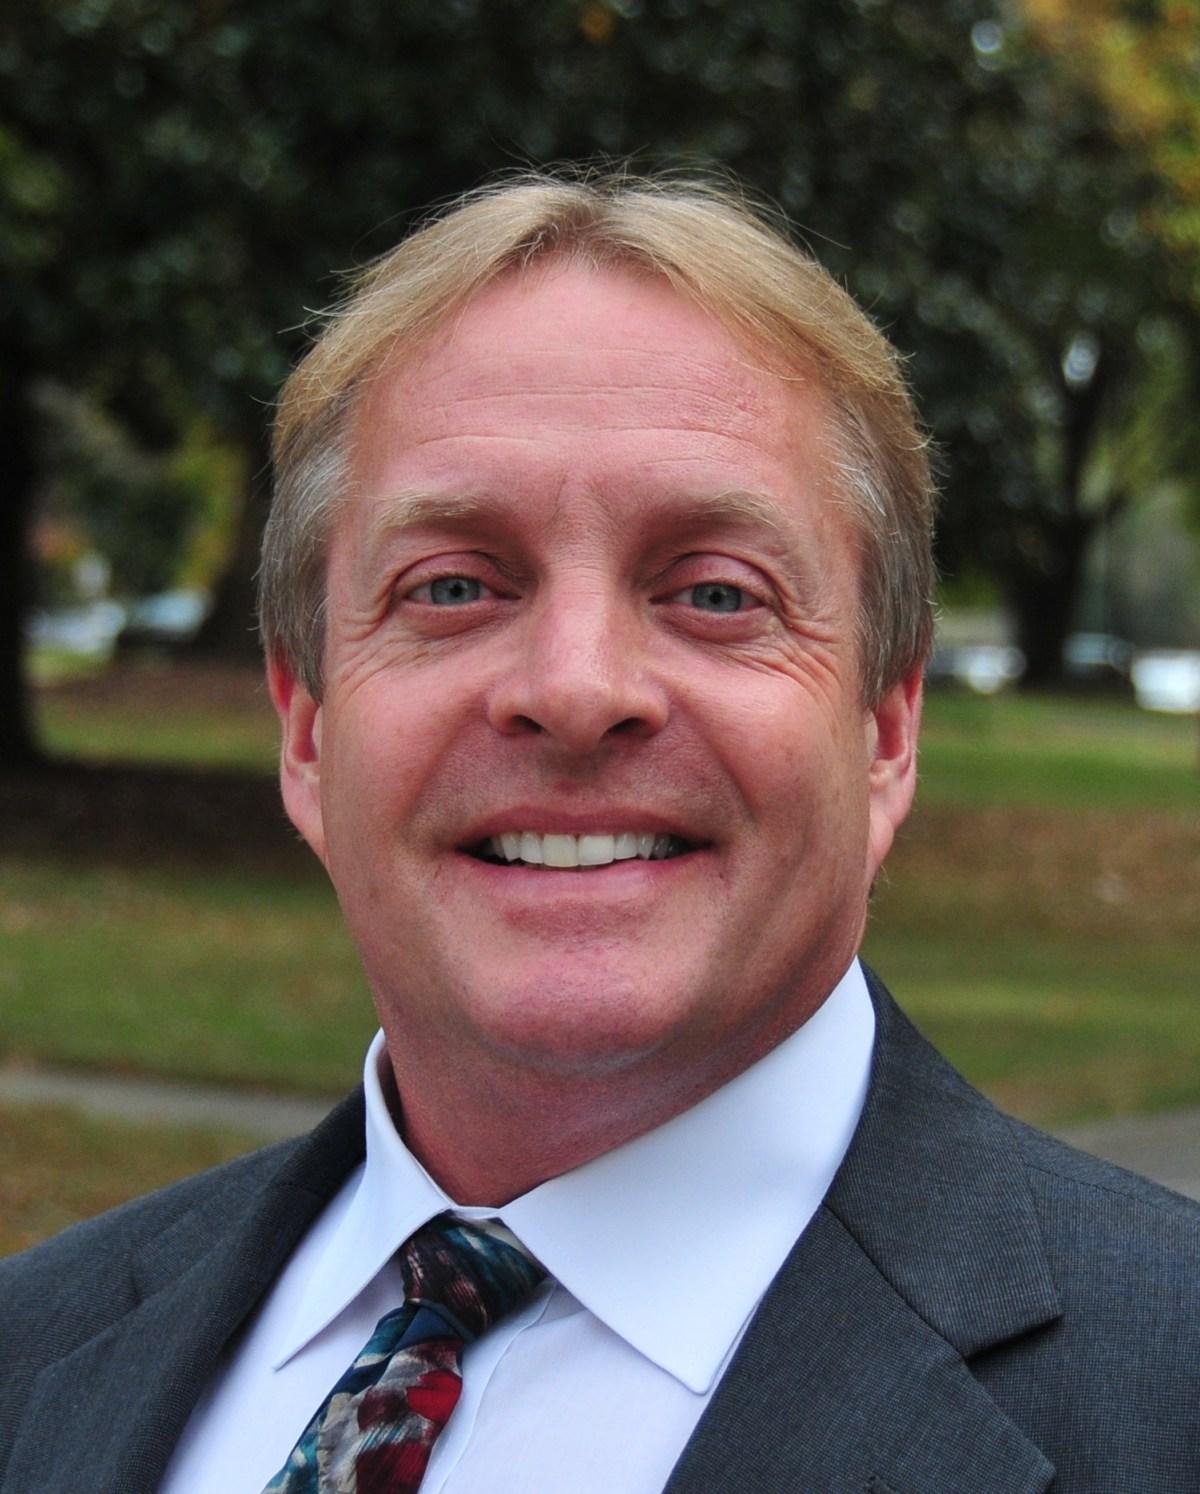 Jeff Horton of the North Carolina Association of Long Term Care Facilities